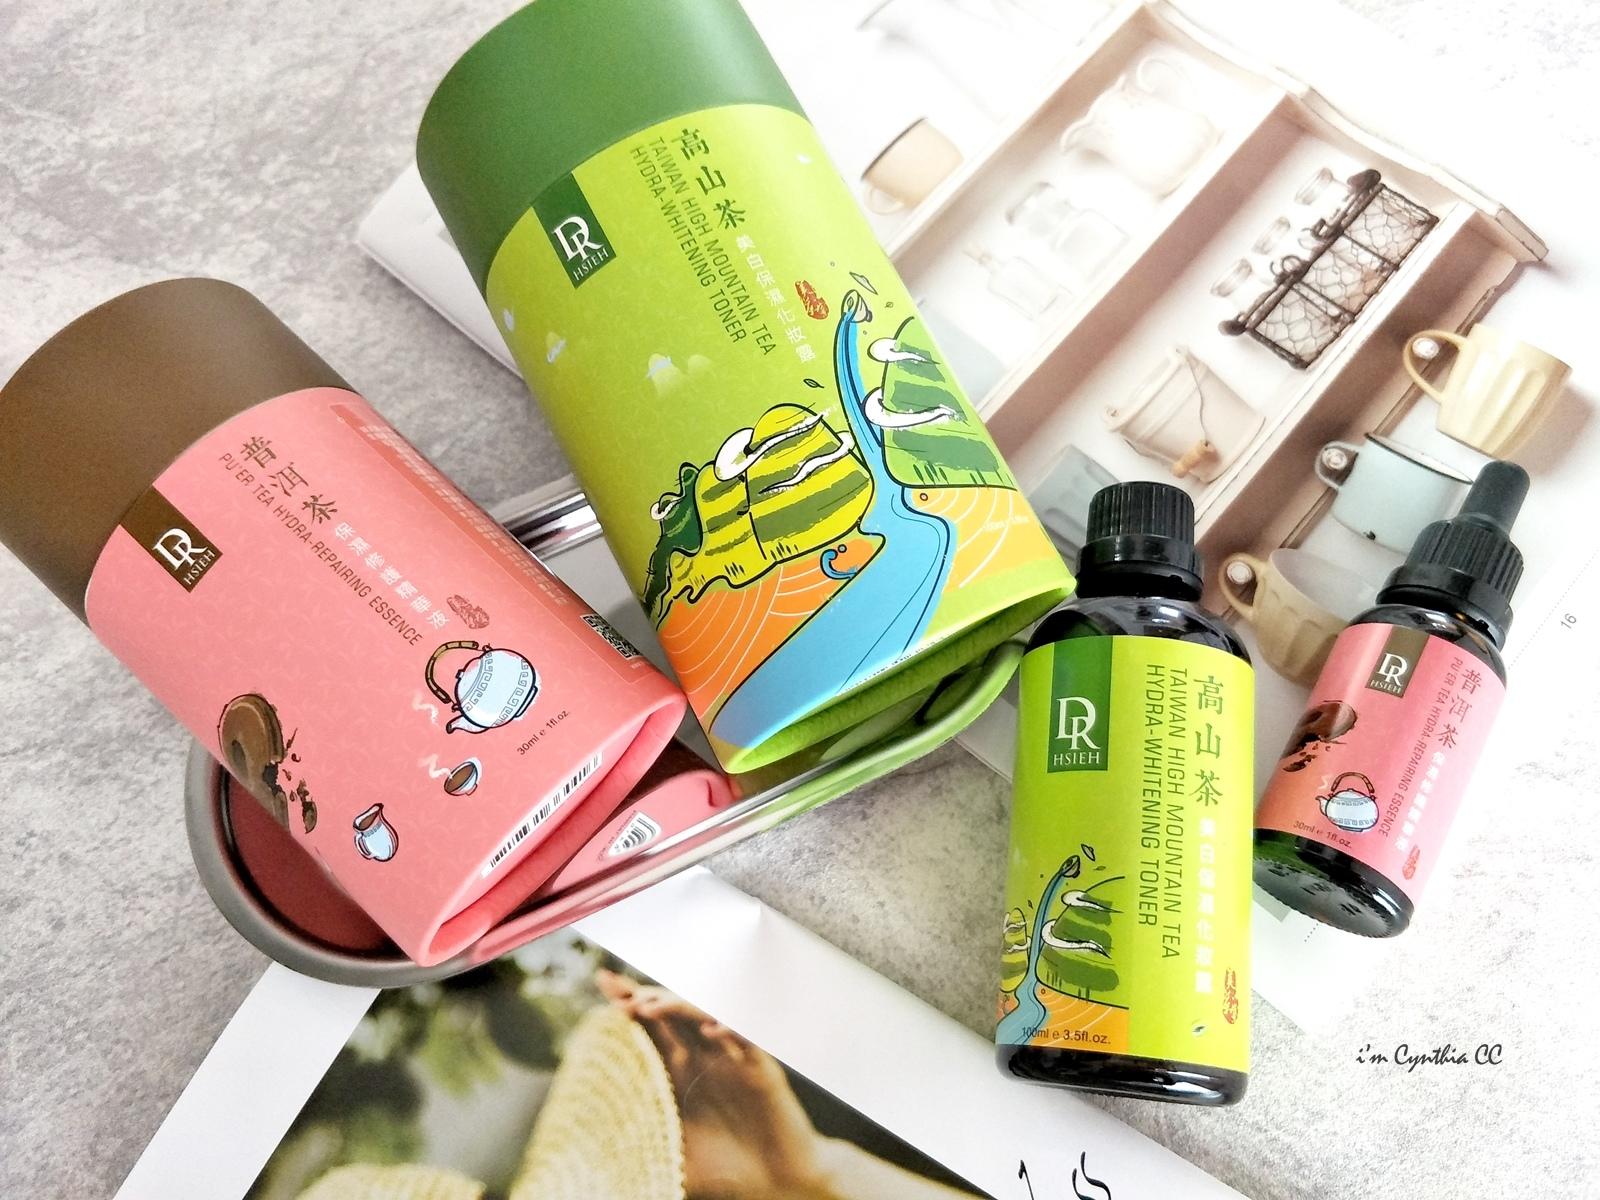 Dr.Hsieh達特醫美茶系列開箱 高山茶美白保濕化妝露、普洱茶保濕修護精華液